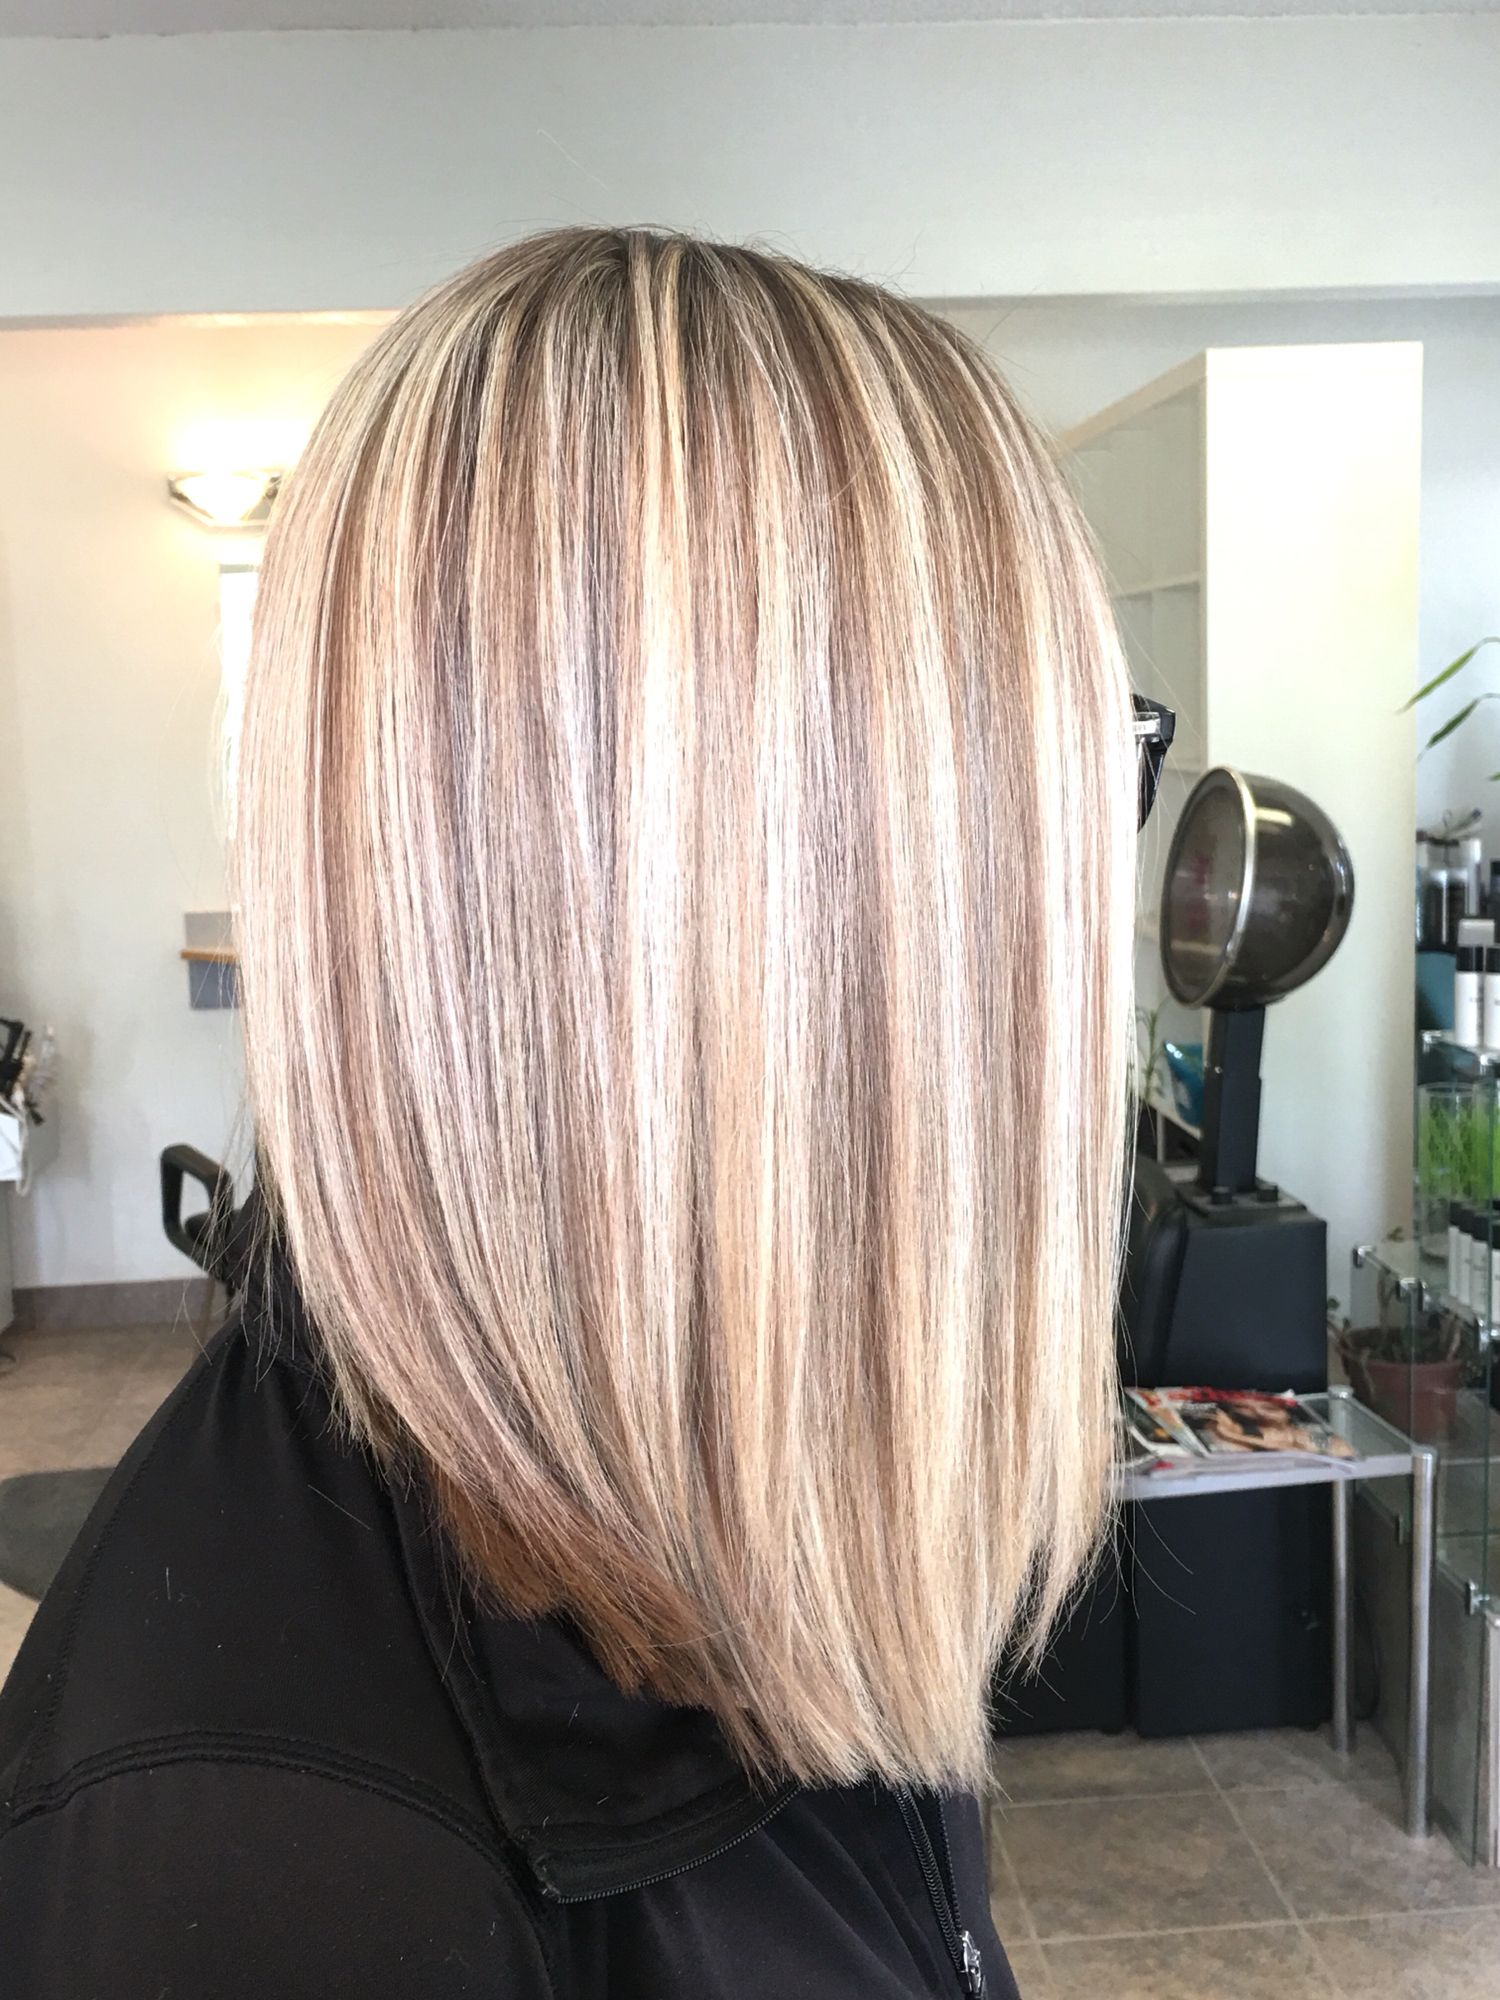 Highlight With A Touch Of Low Light Matrix Lightmaster 10v Lightmaster 20v 7p 8n Morgannab Matrix Hair Color Blonde Hair Colour Shades Hair Color Formulas